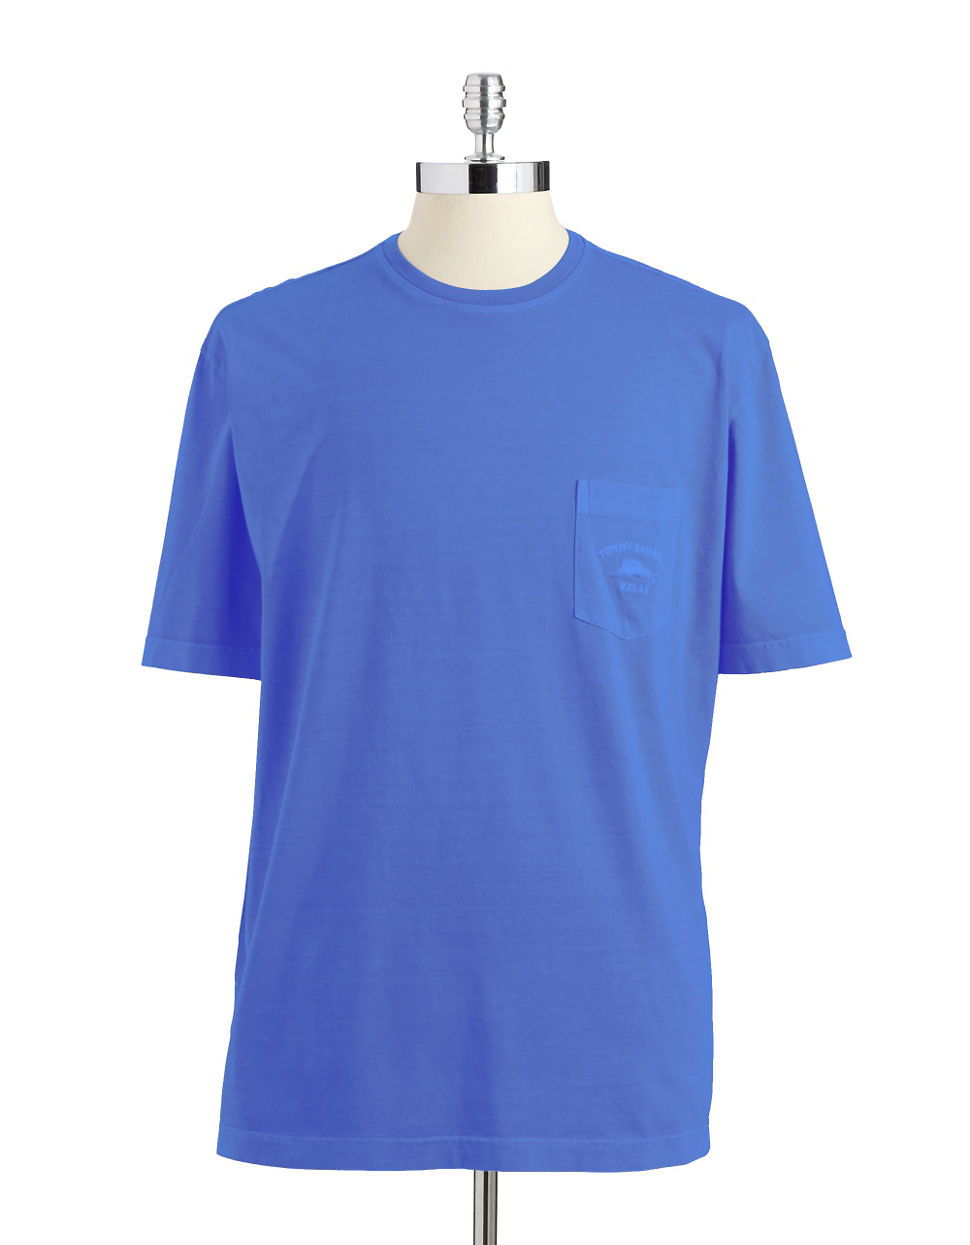 Tommy Bahama Bahama Tide Pima Cotton Pocket Tshirt In Blue